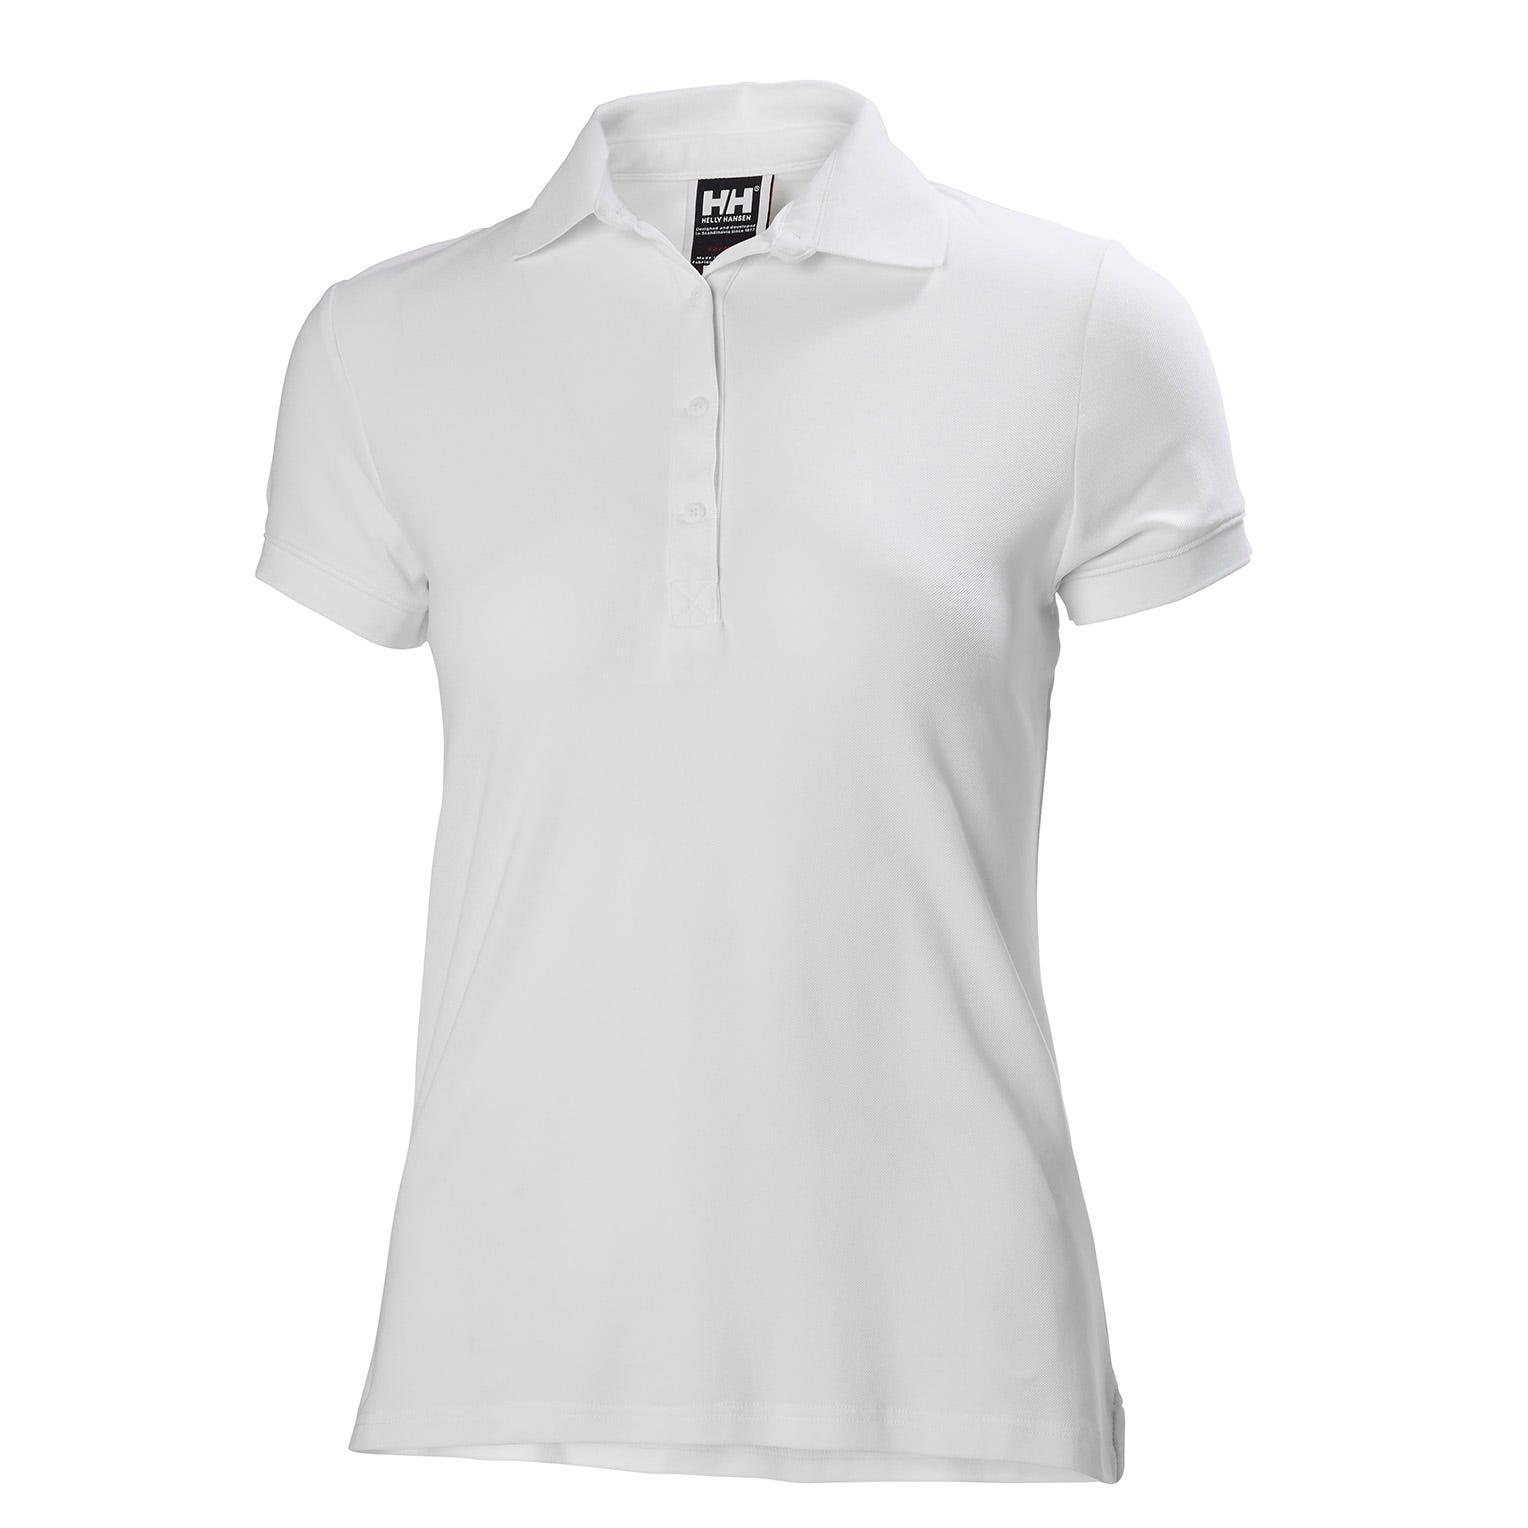 Helly Hansen Womens Crewline Quick-dry Stretch Polo Shirt White Xl